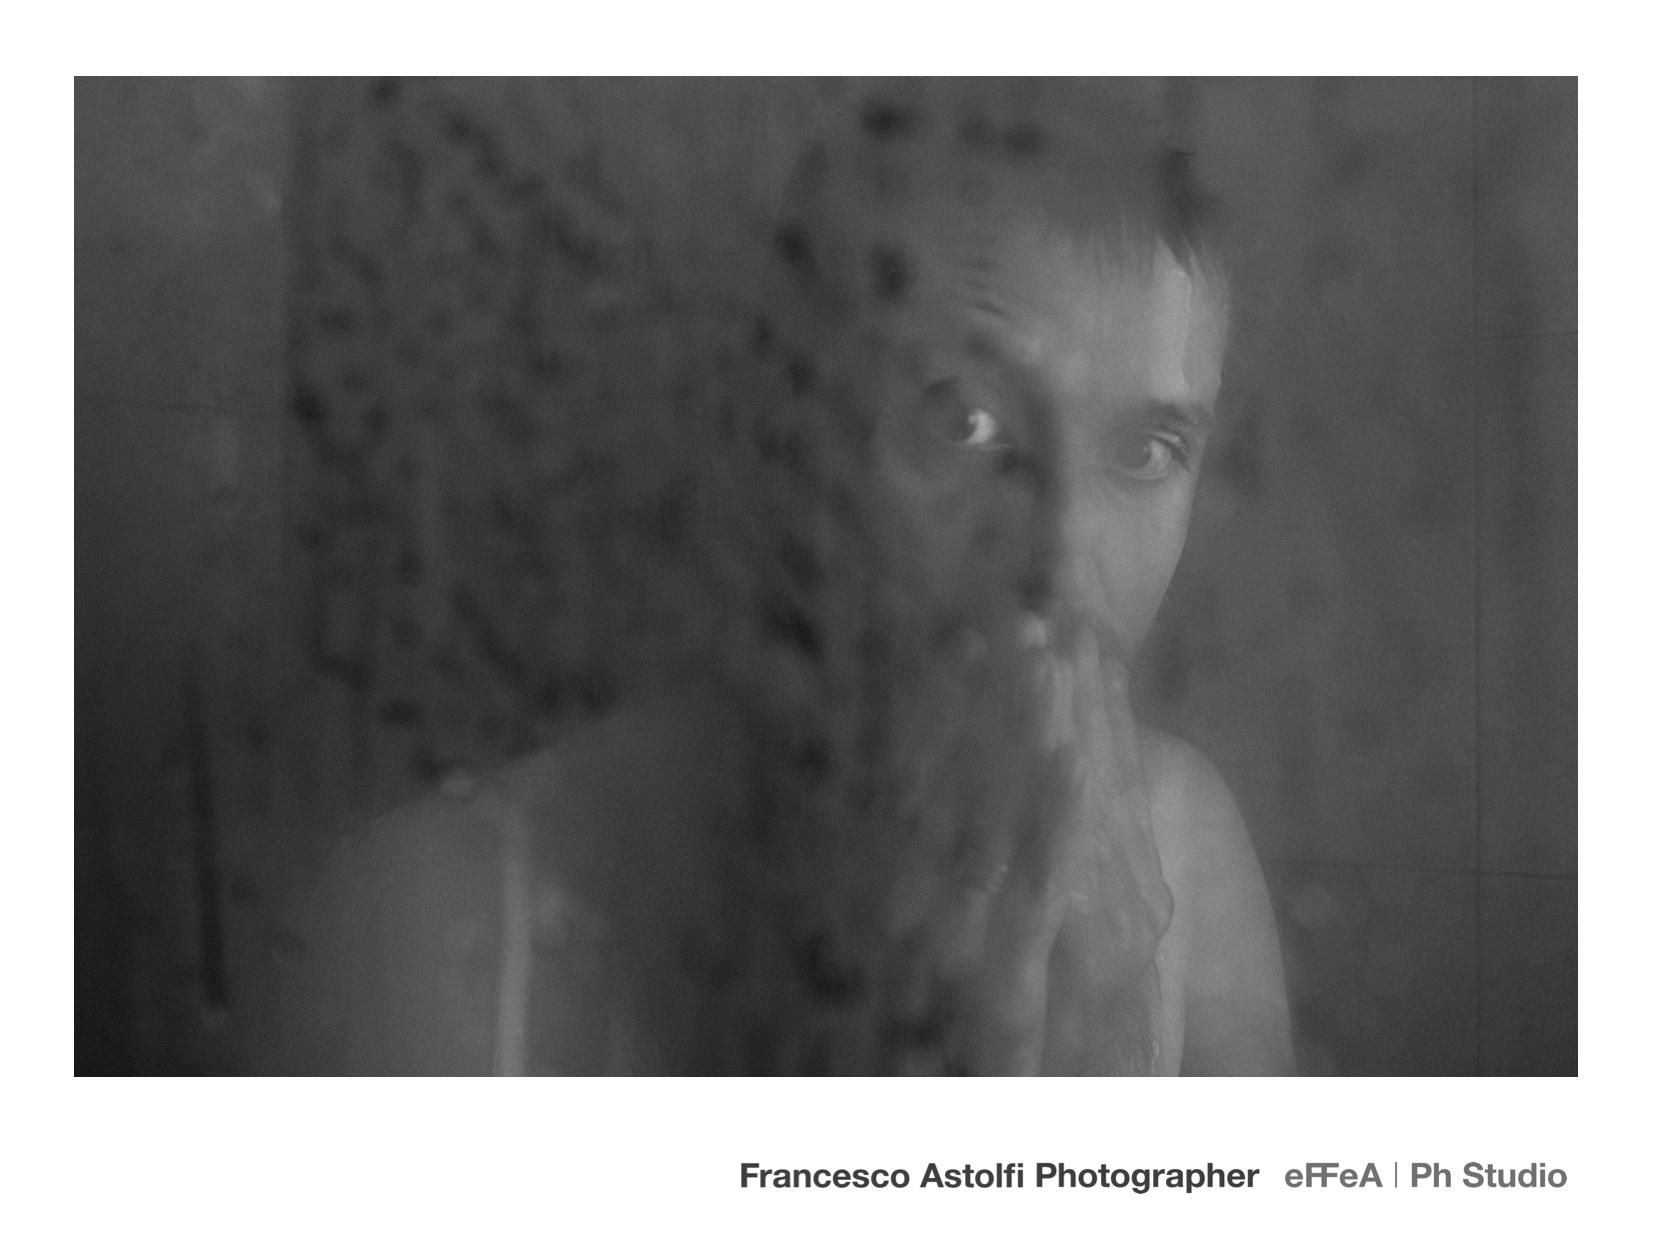 010 - ANDREA S. - Photo by Francesco Astolfi